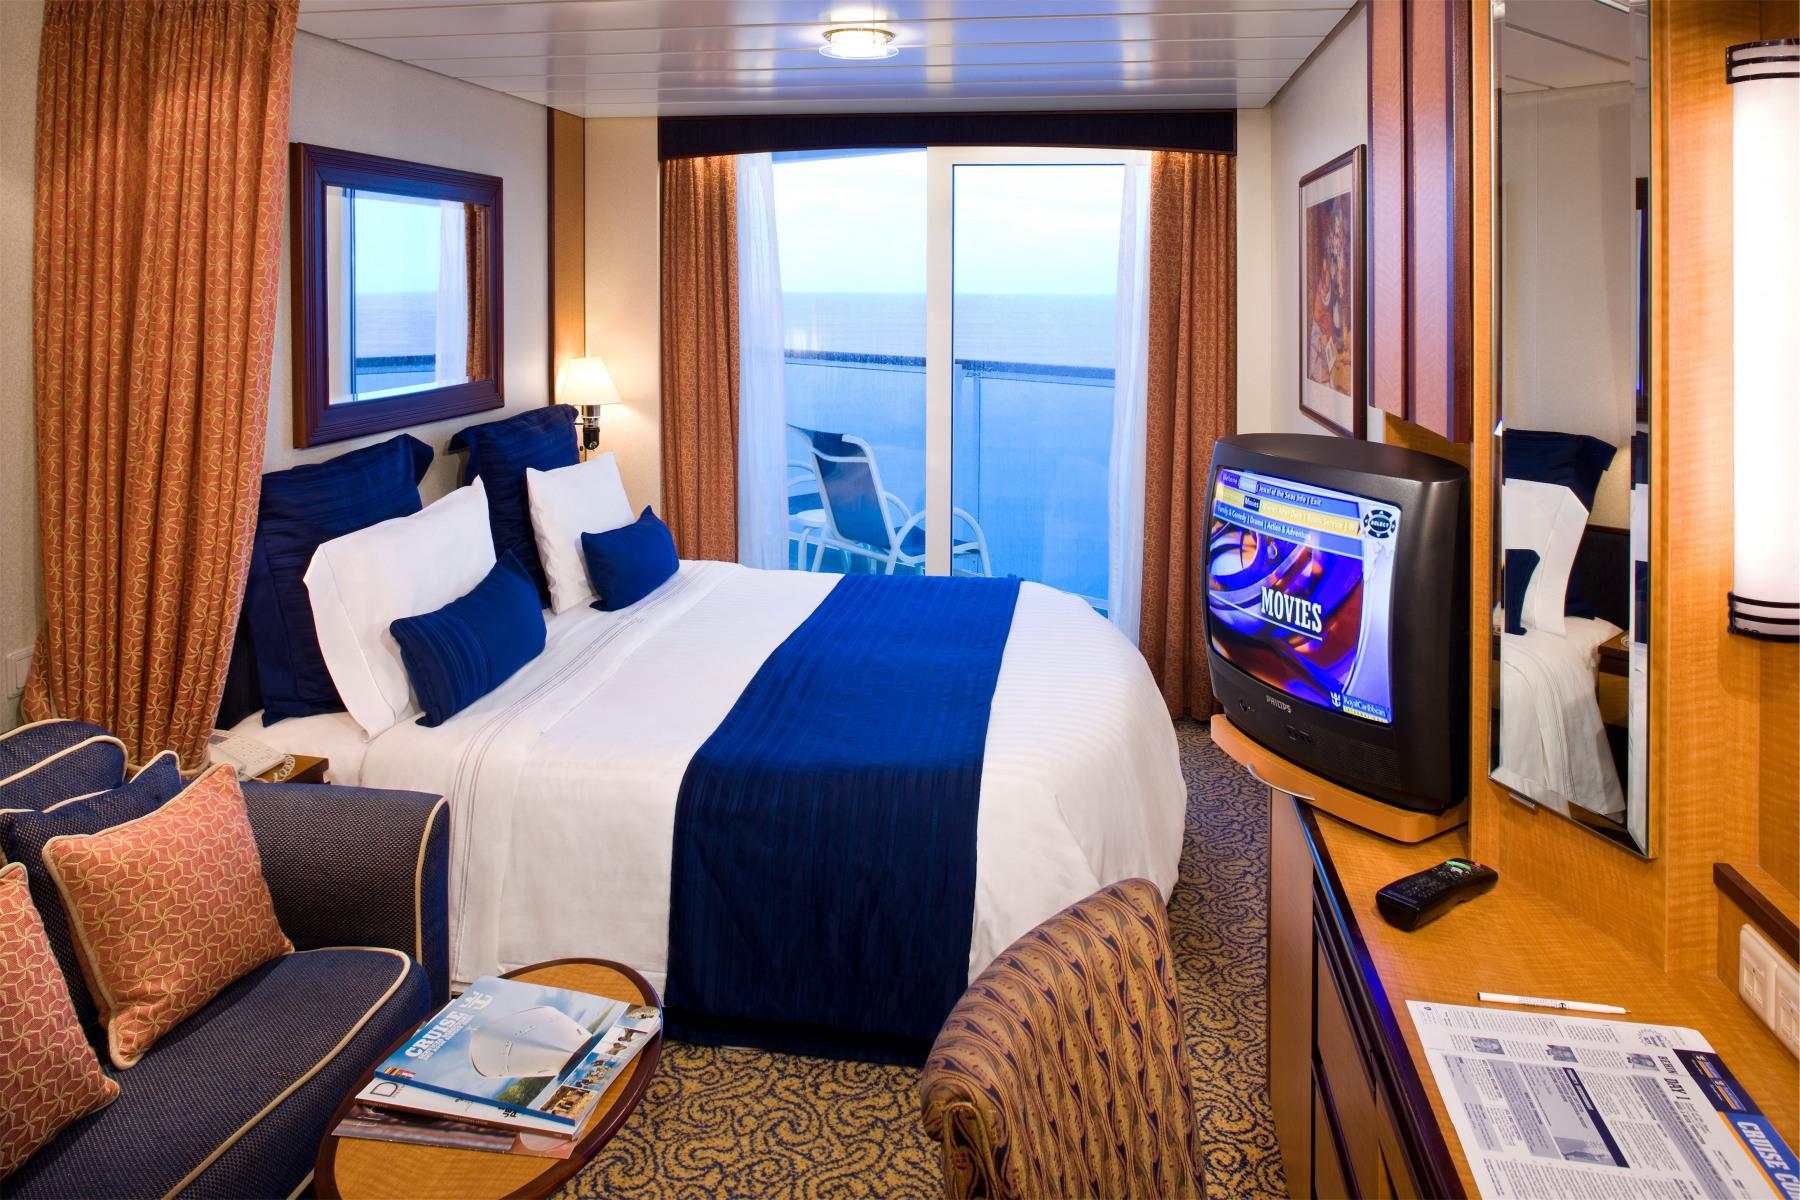 Royal Caribbean International Jewel of the Seas Accommodation Balcony Stateroom.jpg